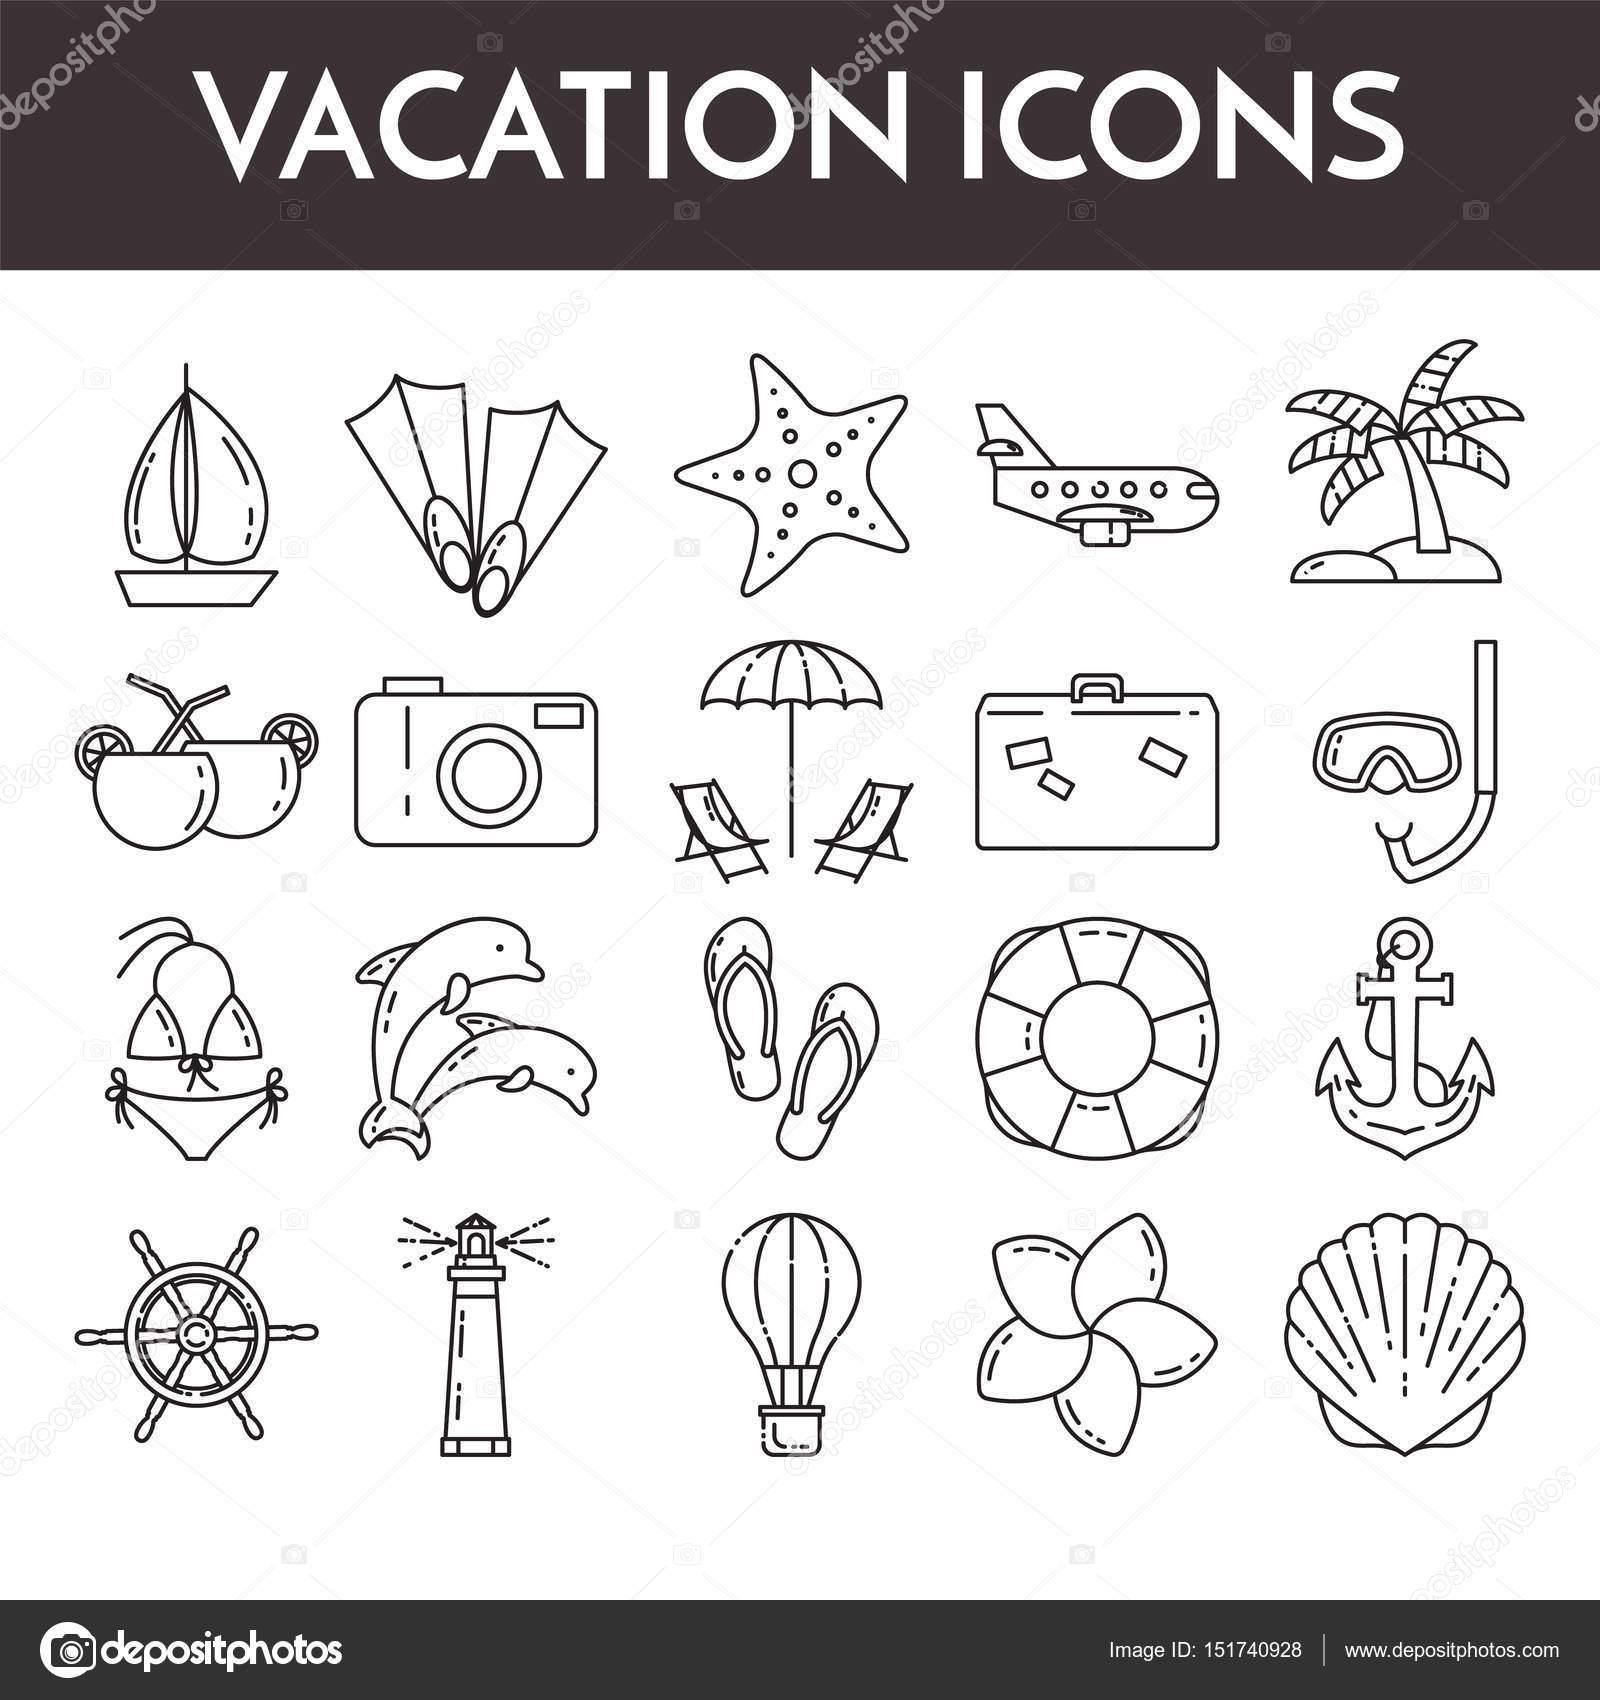 Set of thin line icons with vacation symbols traveling pictograms set of thin line icons with vacation symbols traveling pictograms for websites banners buycottarizona Choice Image